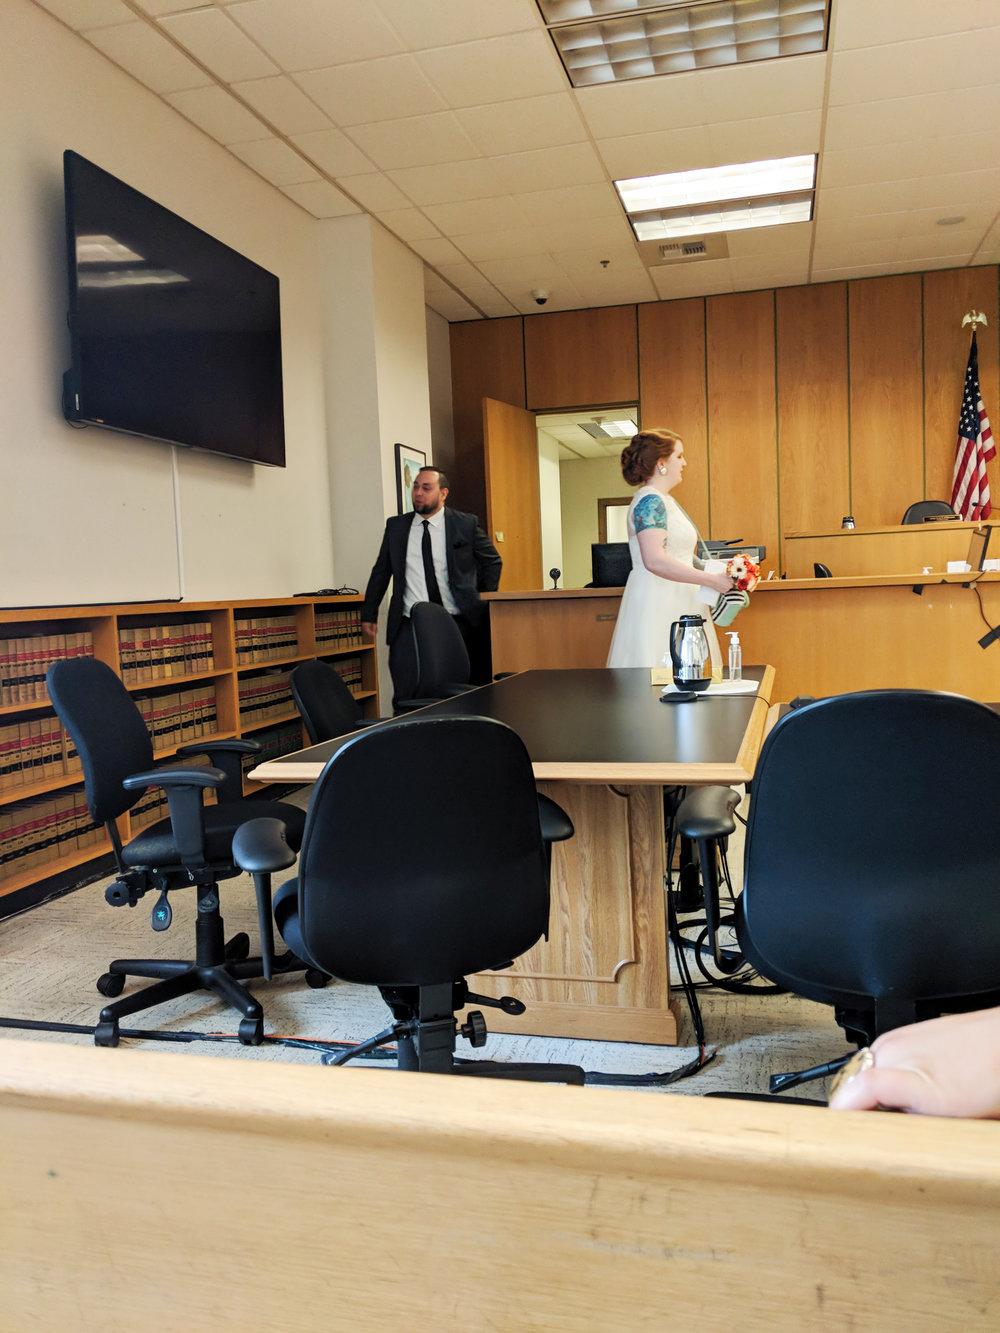 Courthouse-20.jpg